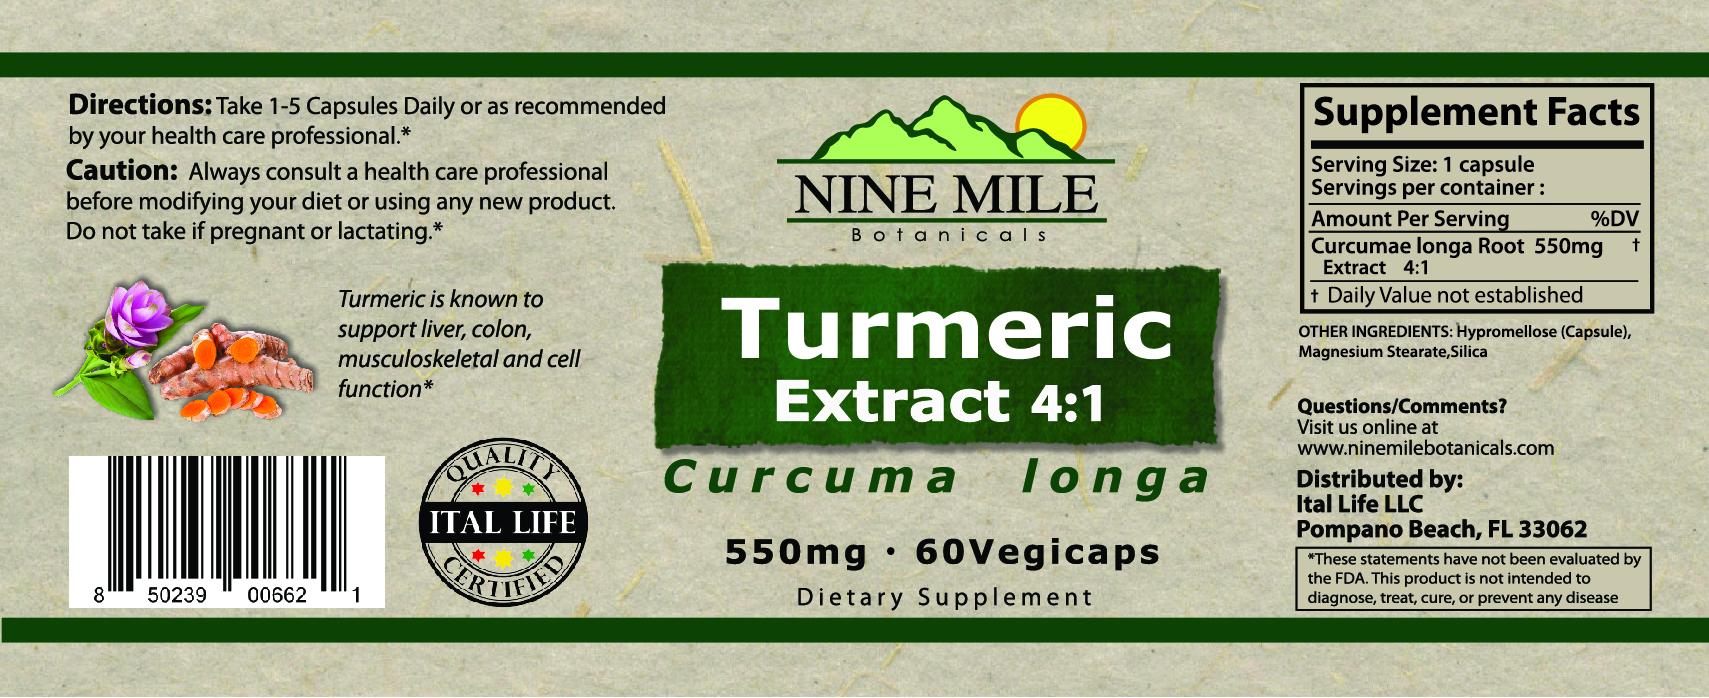 nine Mile Botanicals Turmeric Label